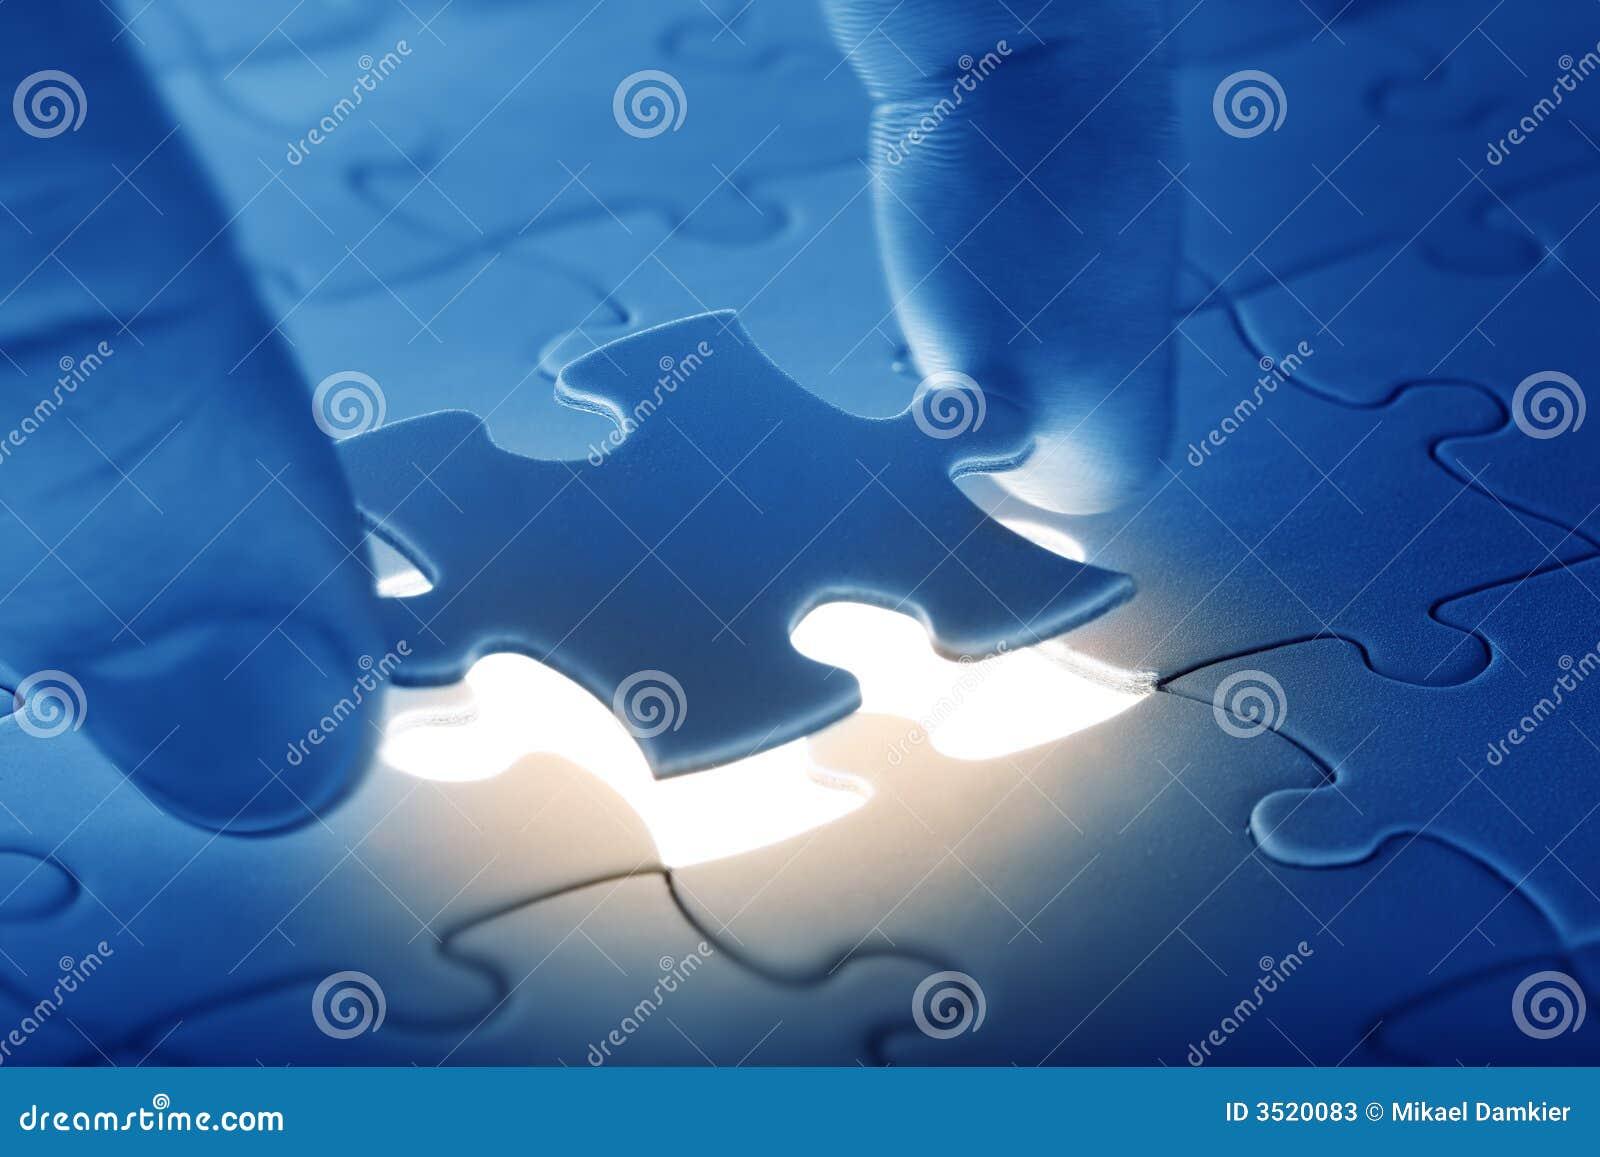 Hands placing last piece of a